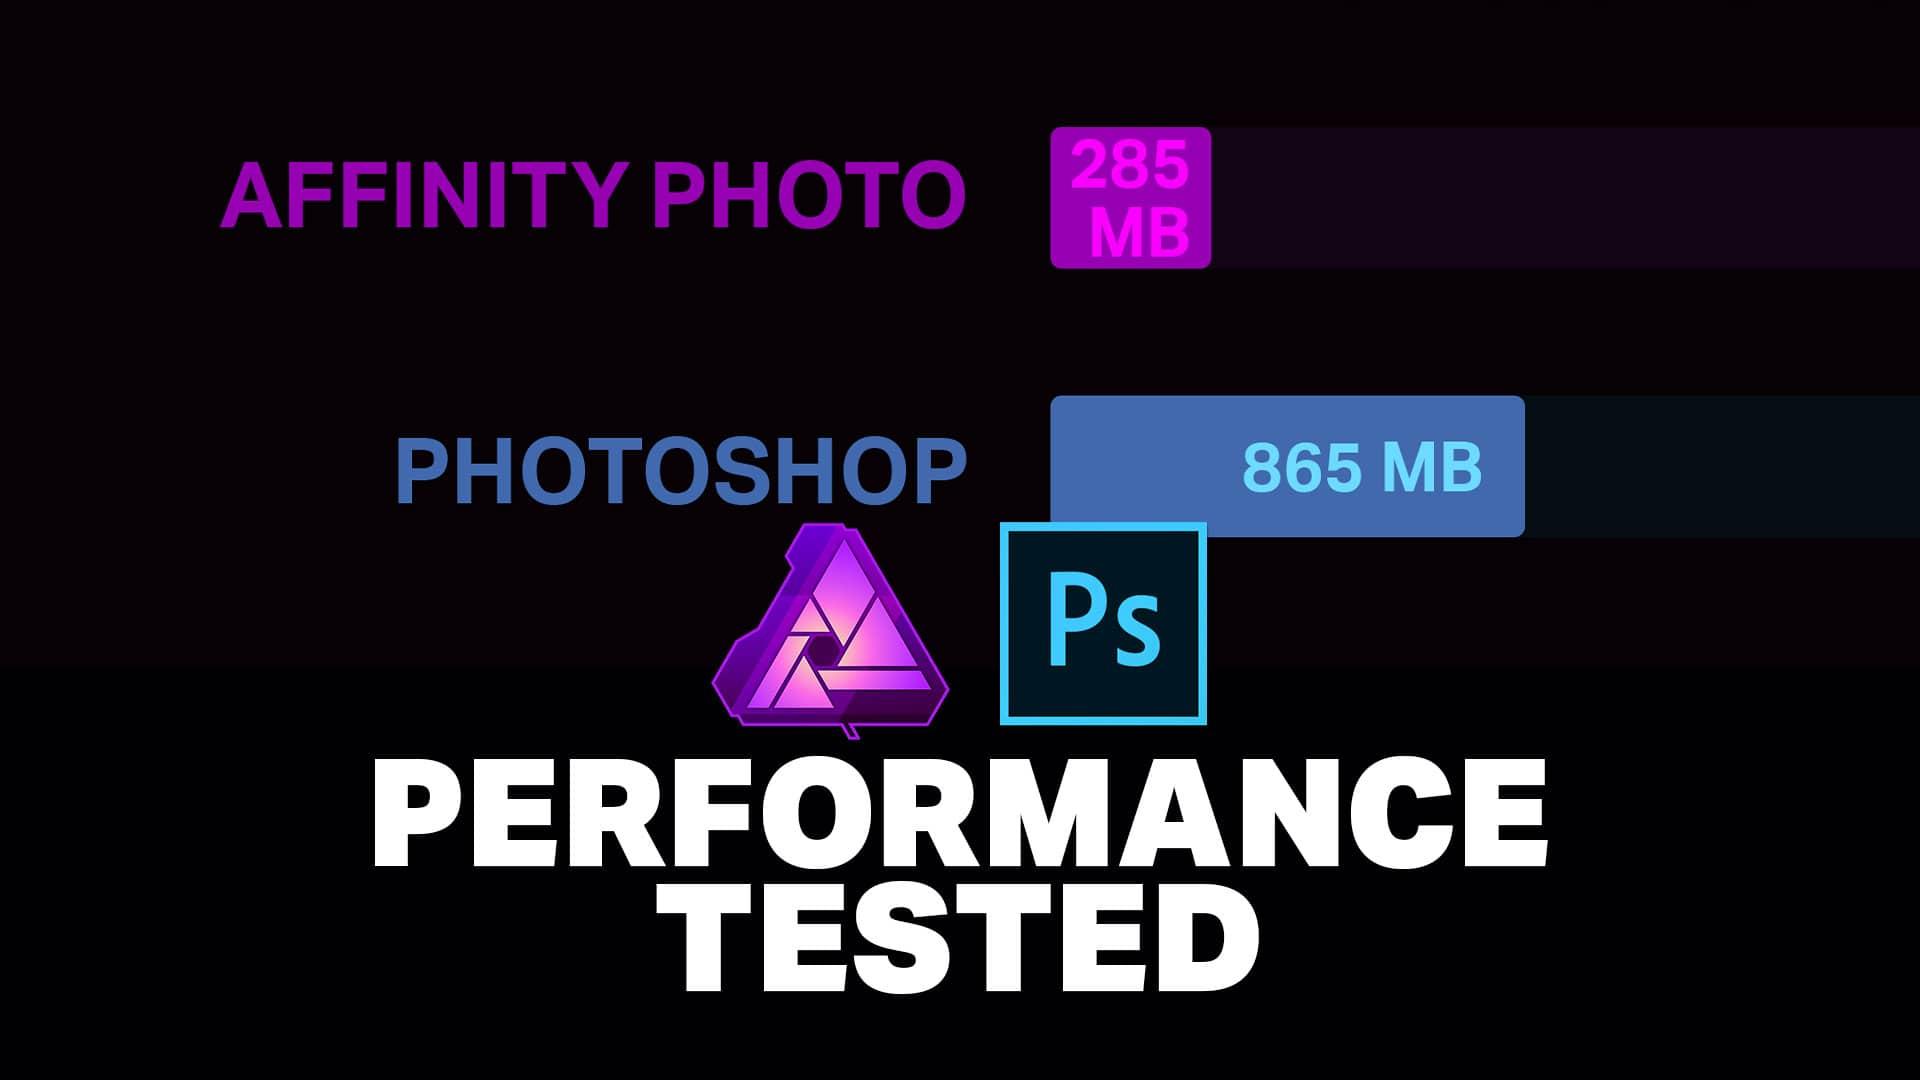 Performance: Affinity Photo vs Photoshop